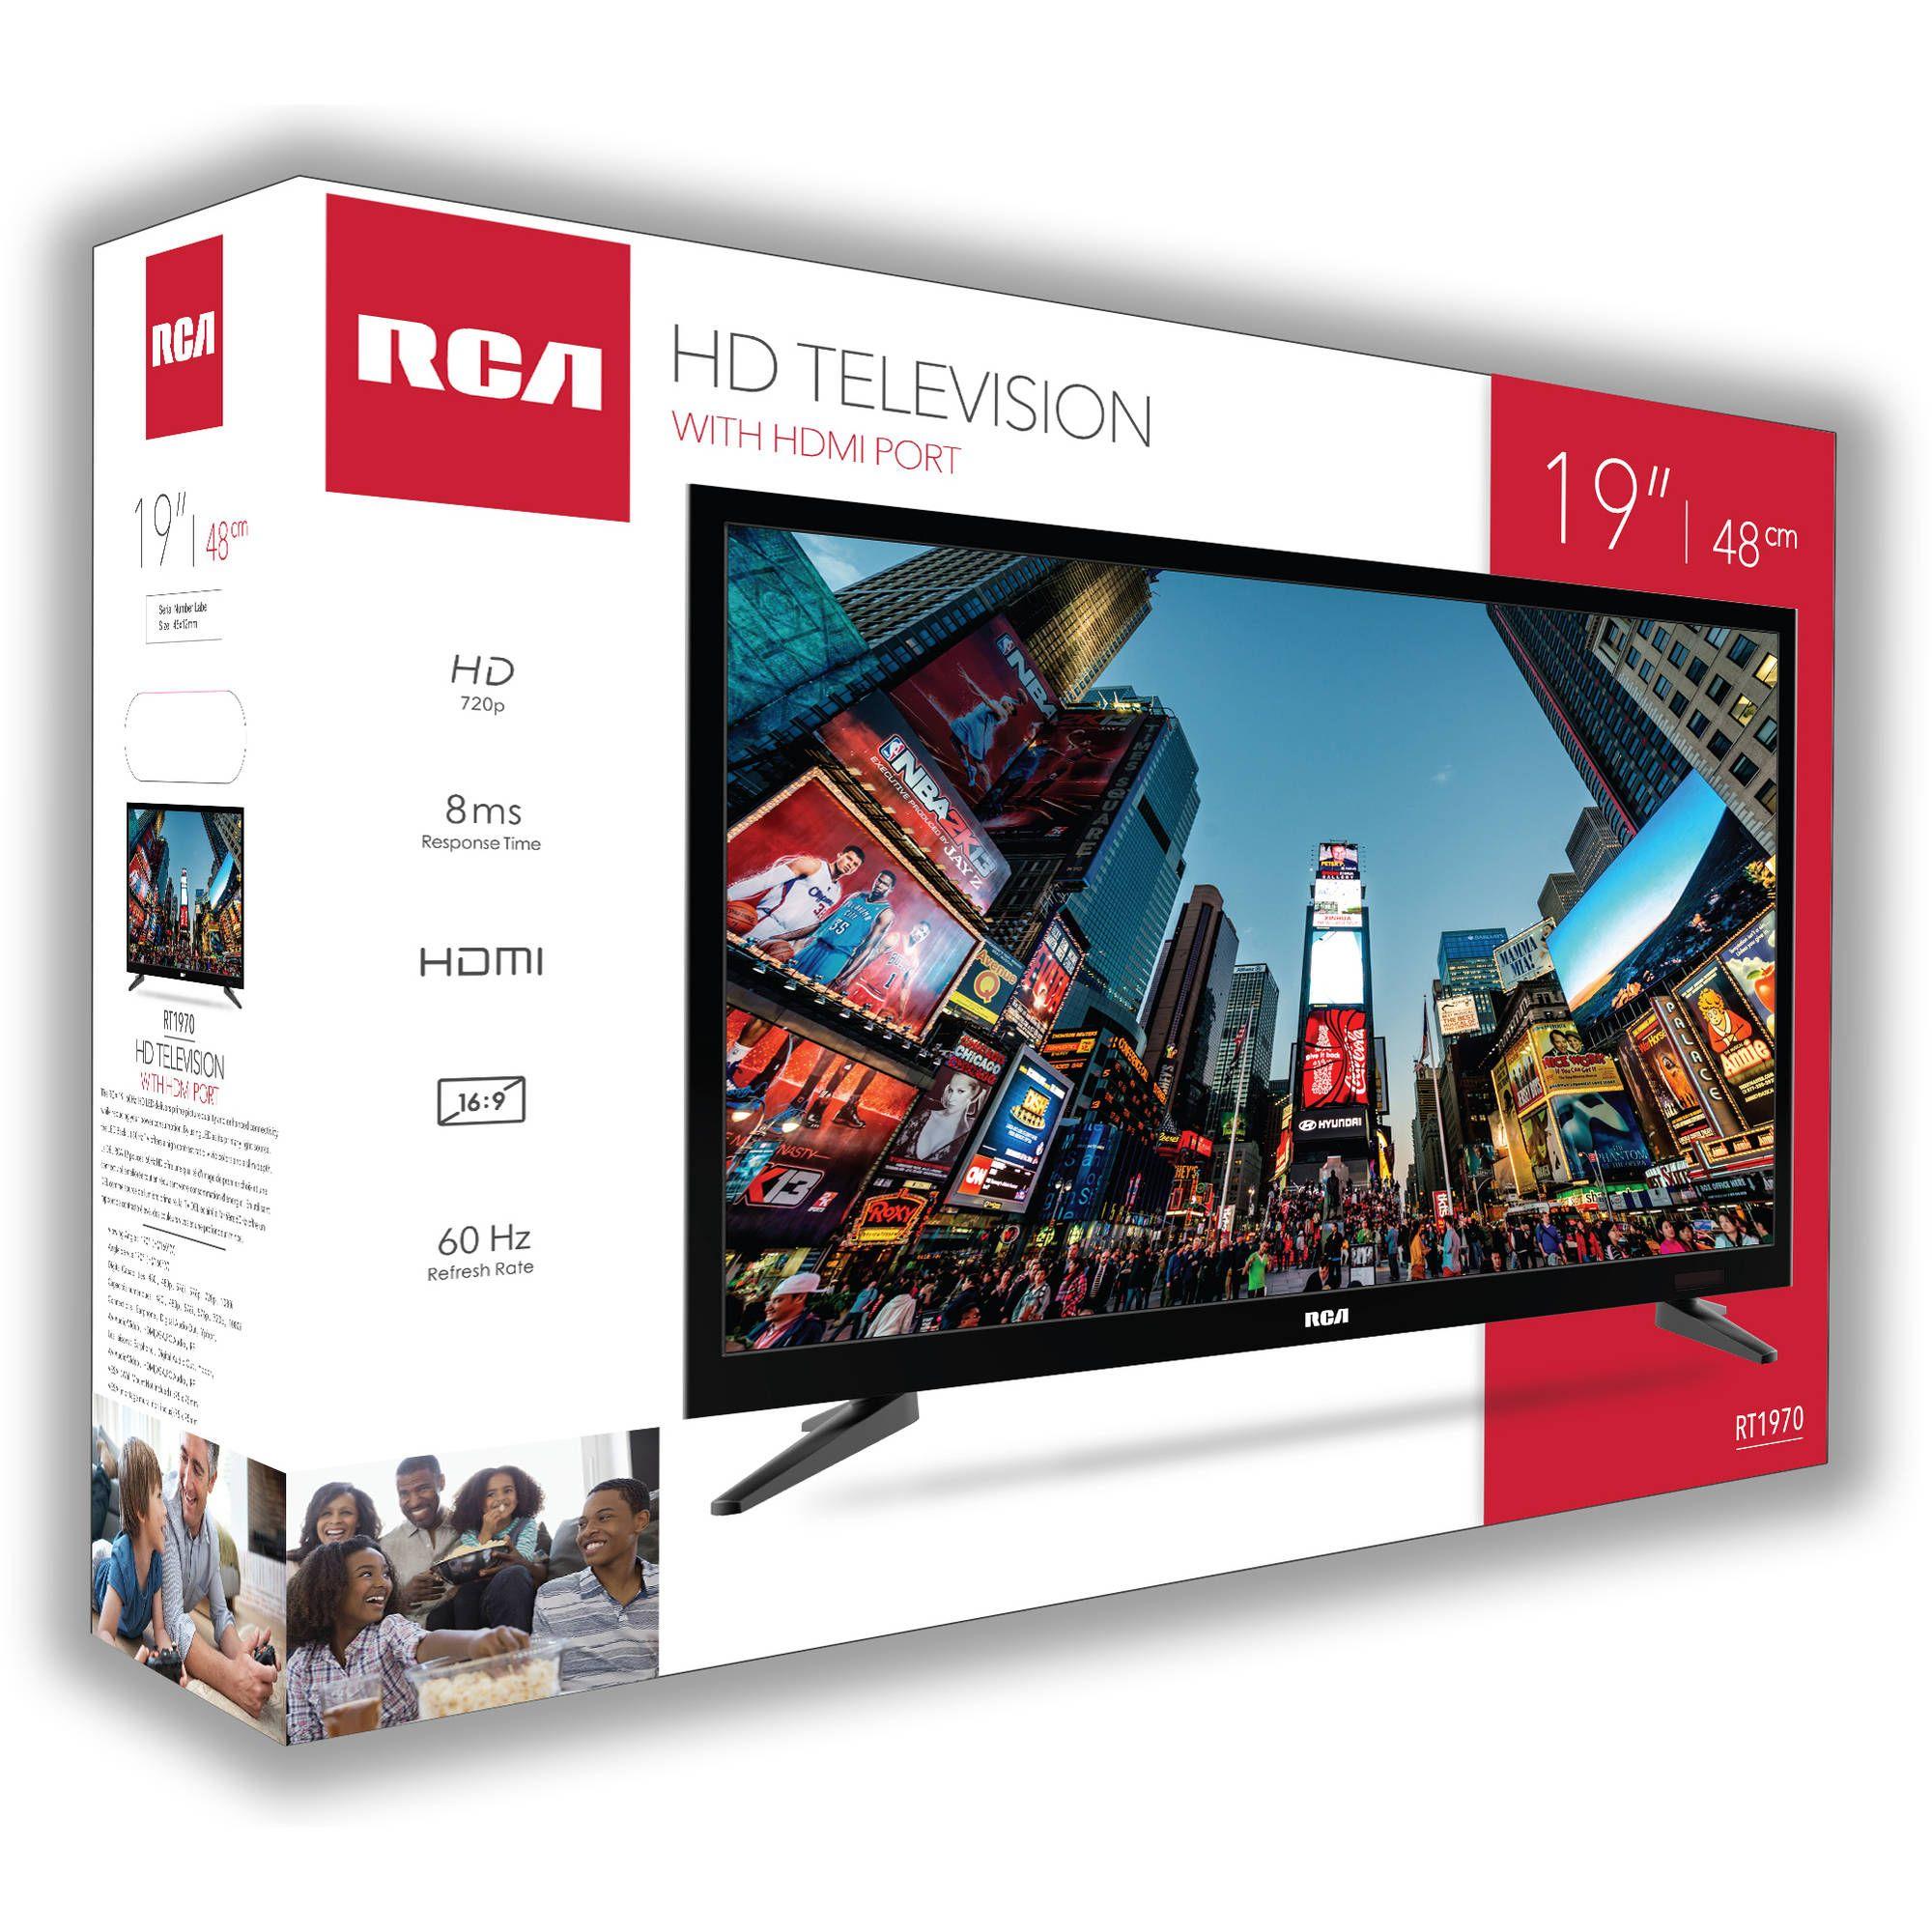 Rca 19 Class Hd 720p Led Tv Rt1970 Walmart Com Led Tv Hdmi Rca